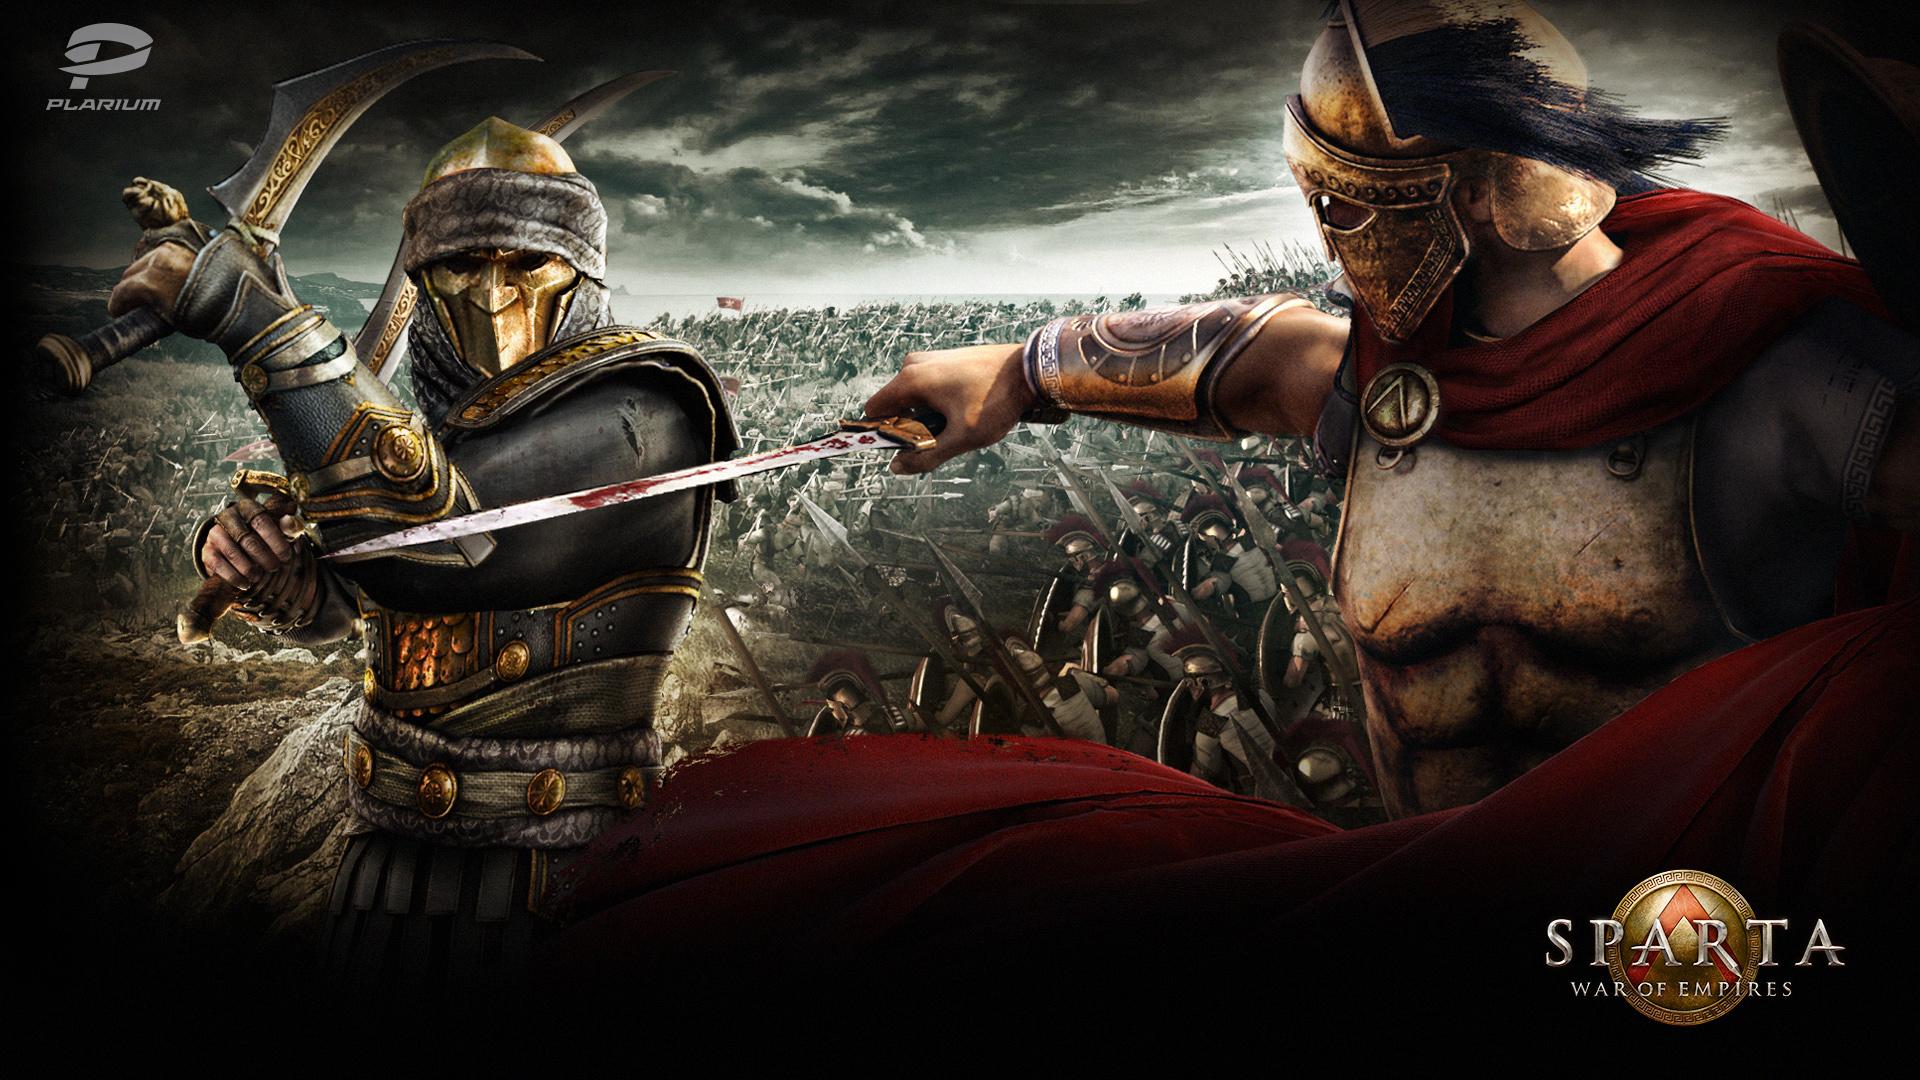 02-sparta-war-of-empires-wallpaper